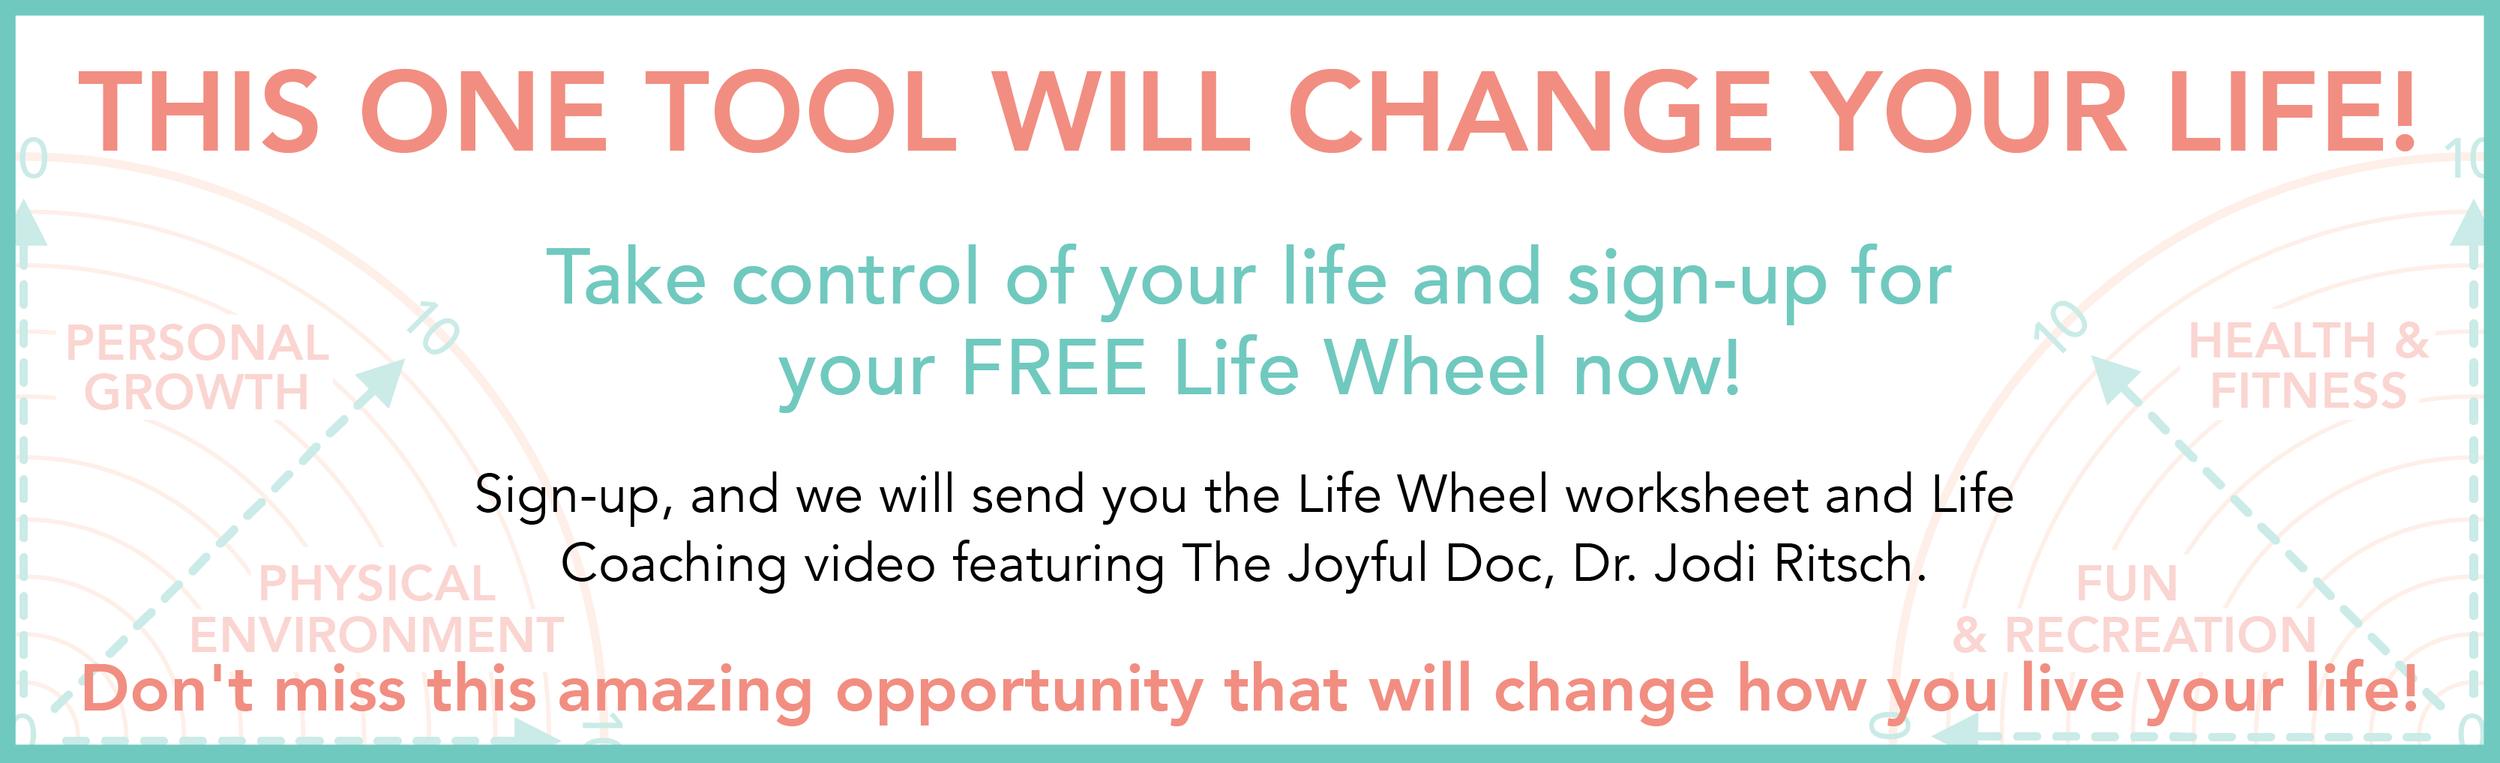 Your Life Wheel Journey Begins Now! -